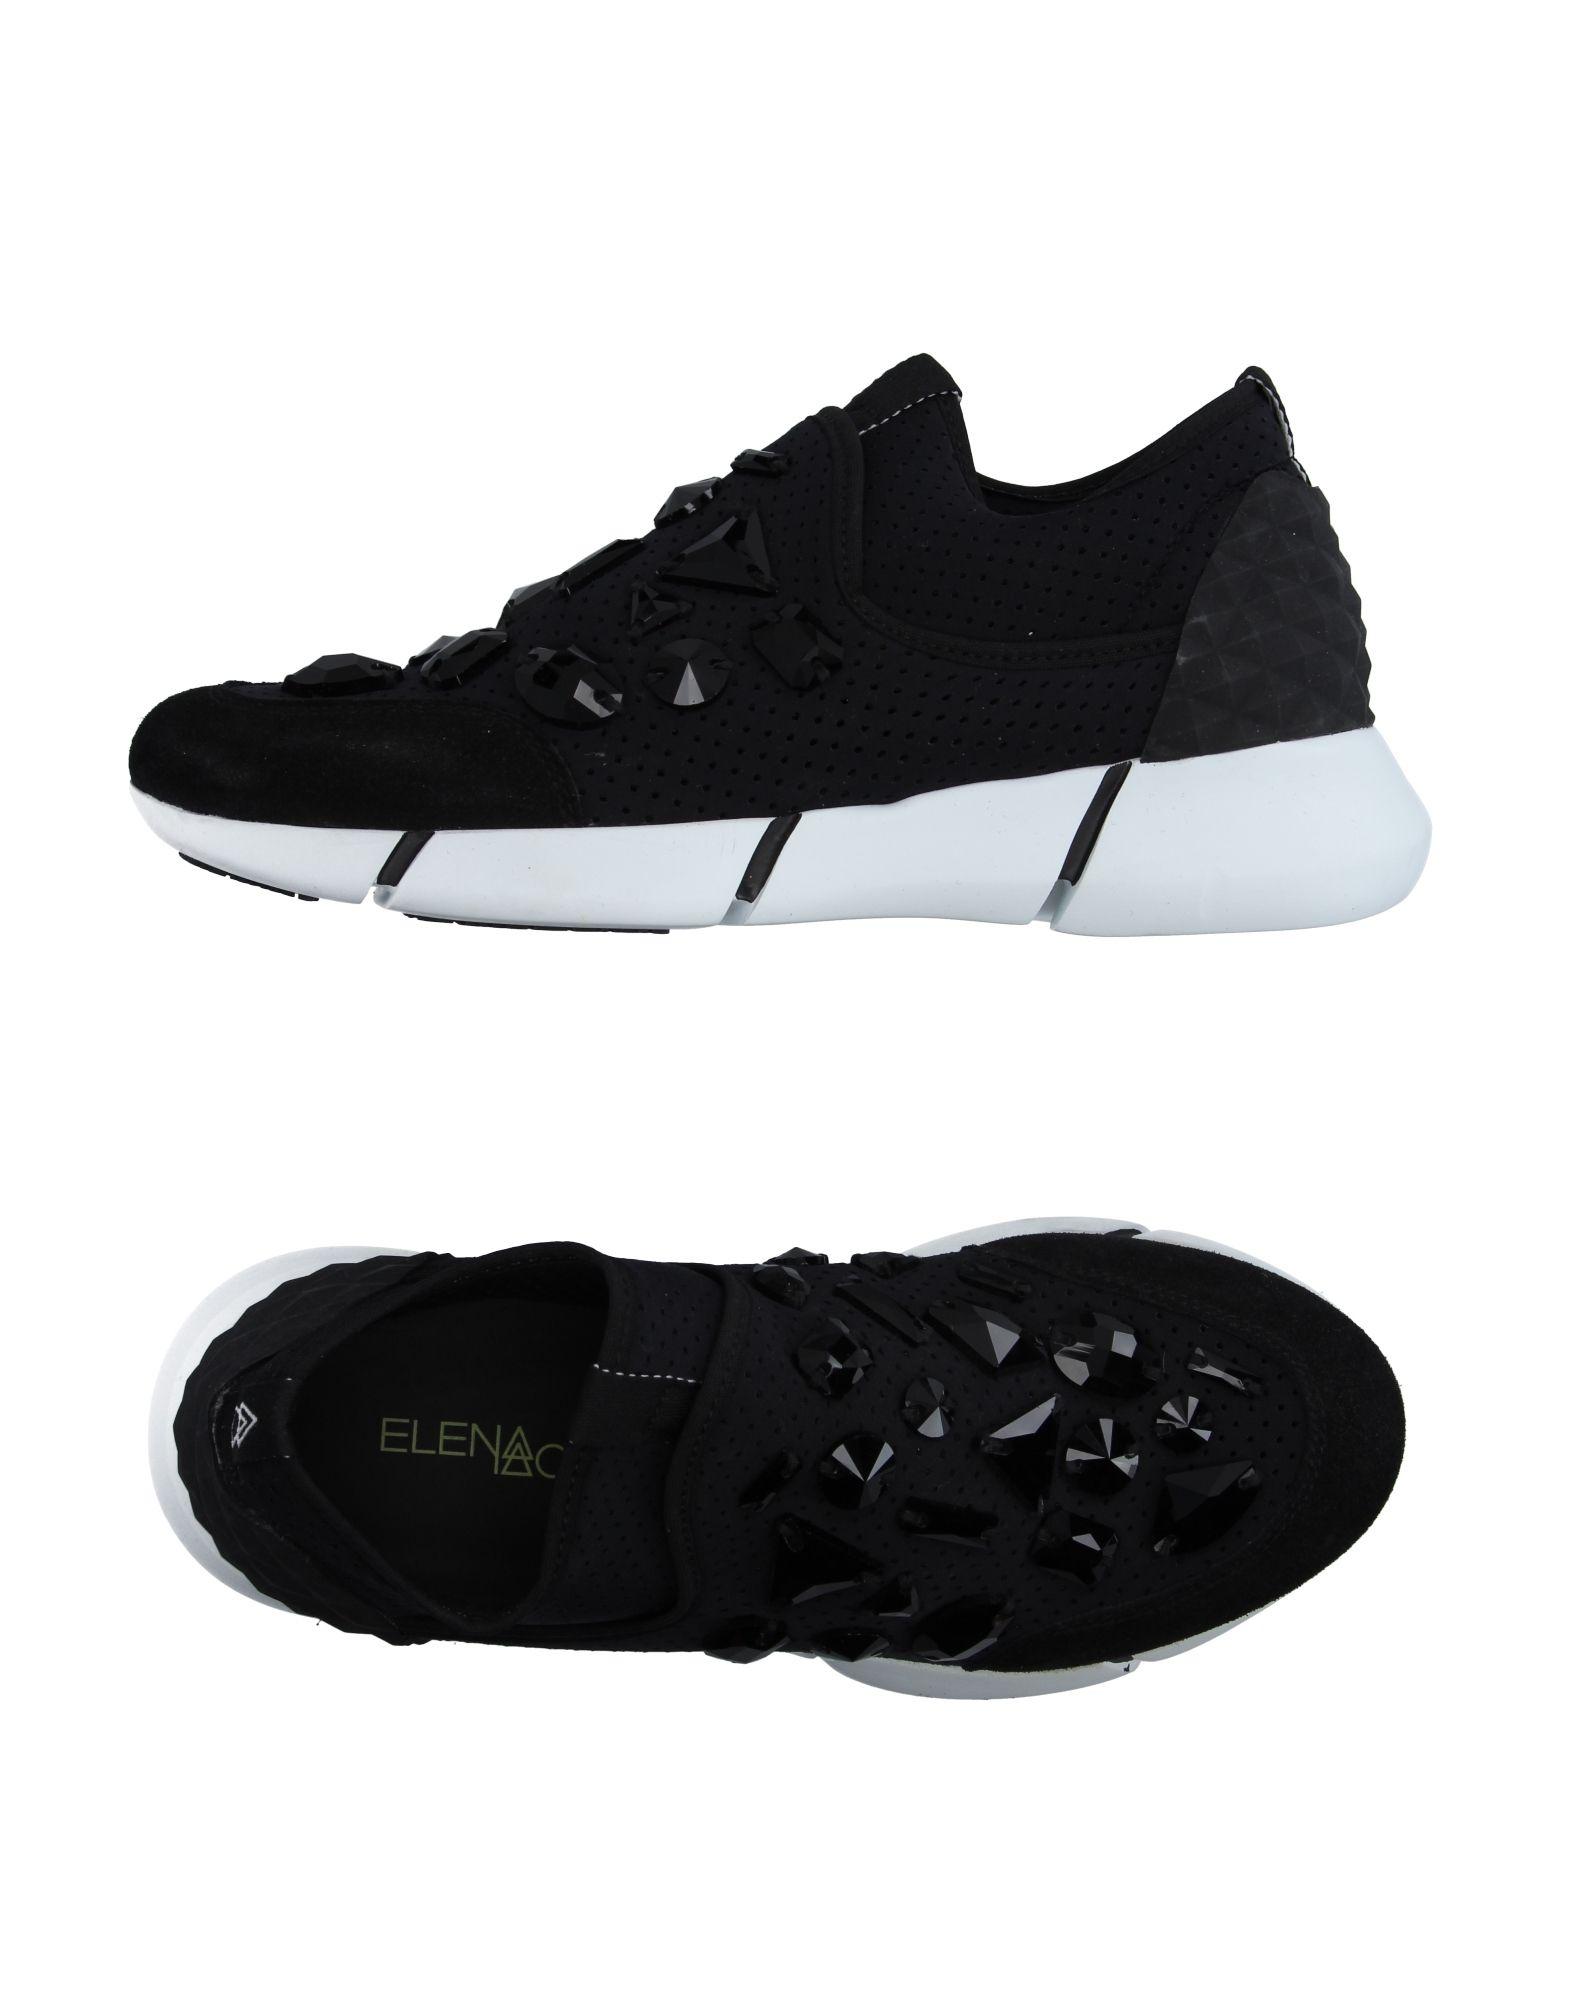 Elena Iachi 11122277KLGut Sneakers Damen  11122277KLGut Iachi aussehende strapazierfähige Schuhe 43f325